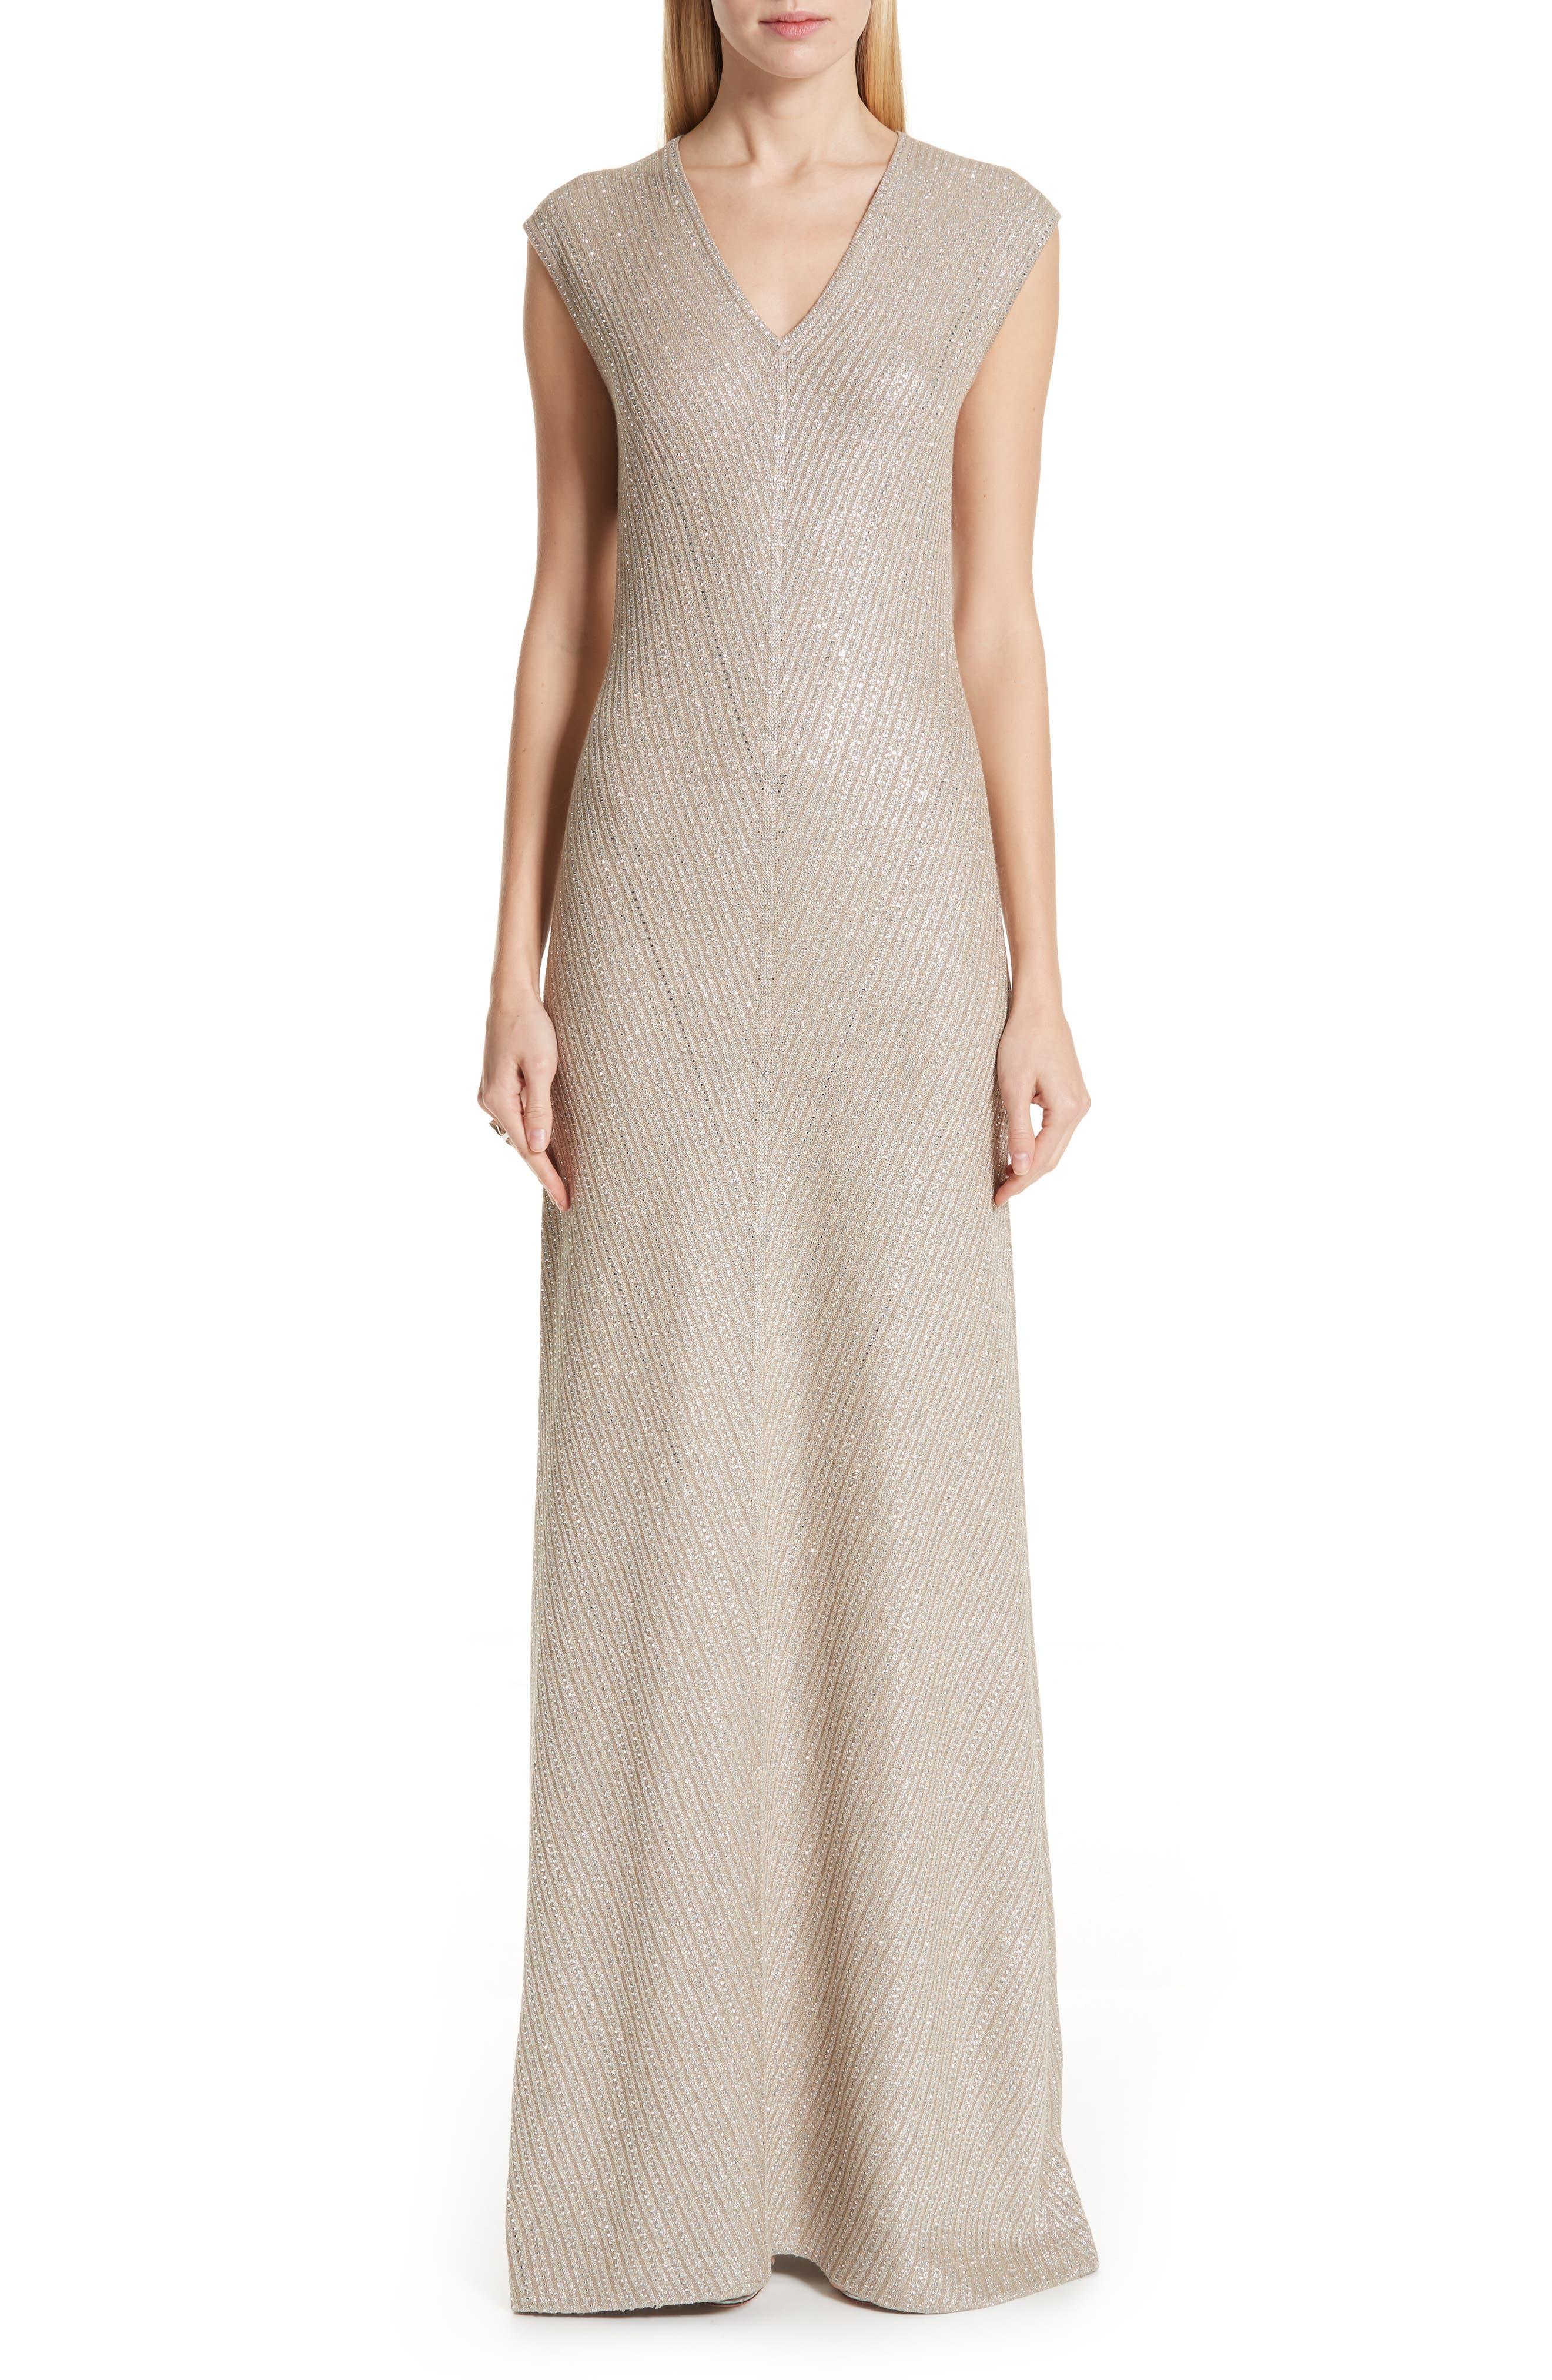 ST. JOHN COLLECTION Brielle Knit V-Neck Gown, Main, color, DARK KHAKI/ GOLD